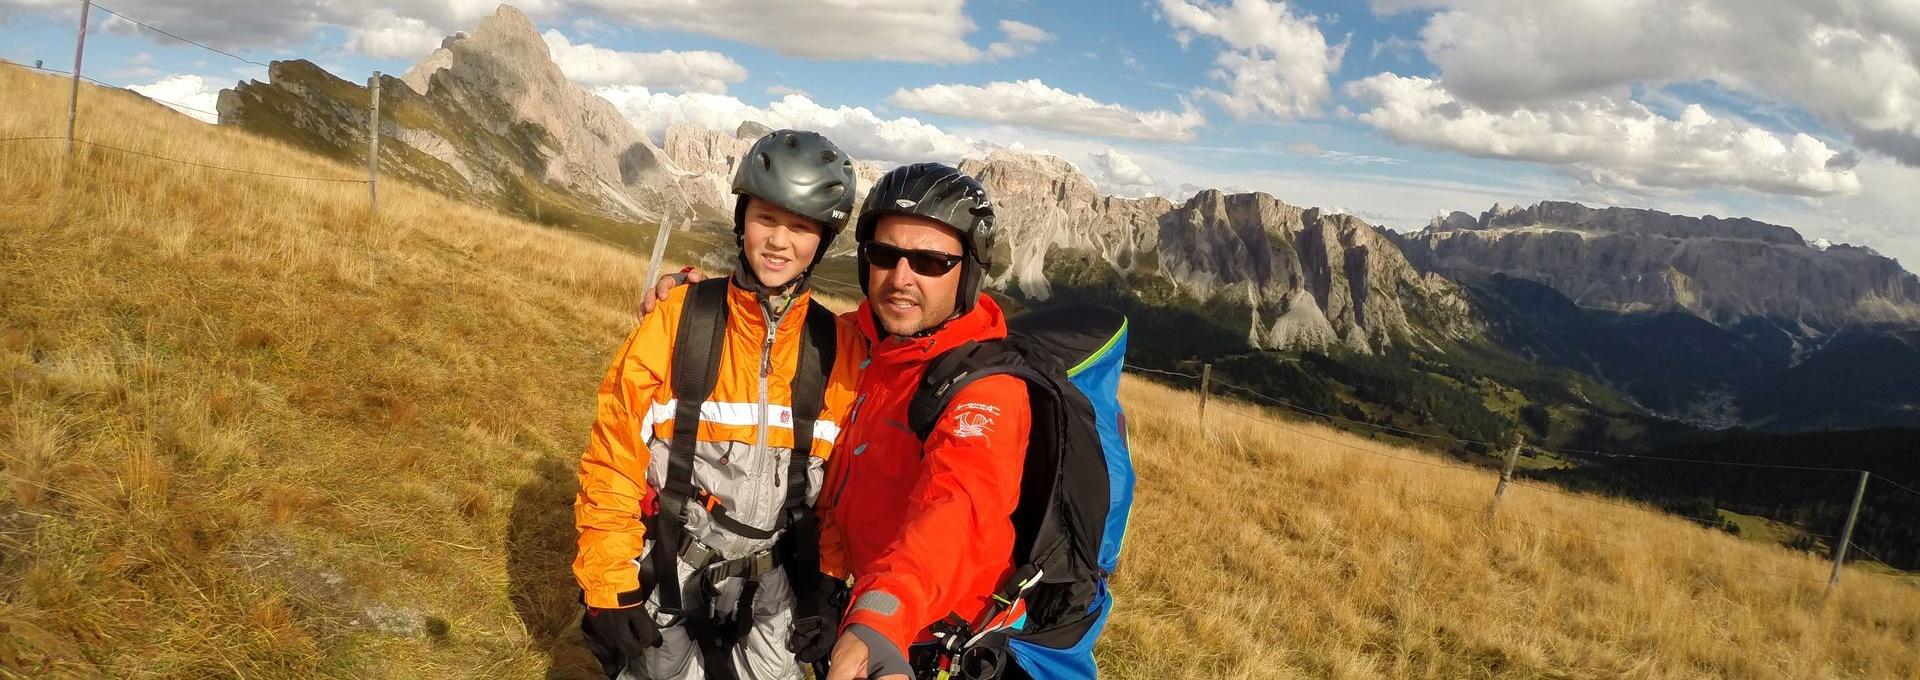 Start Area - paragliding Val Gardena